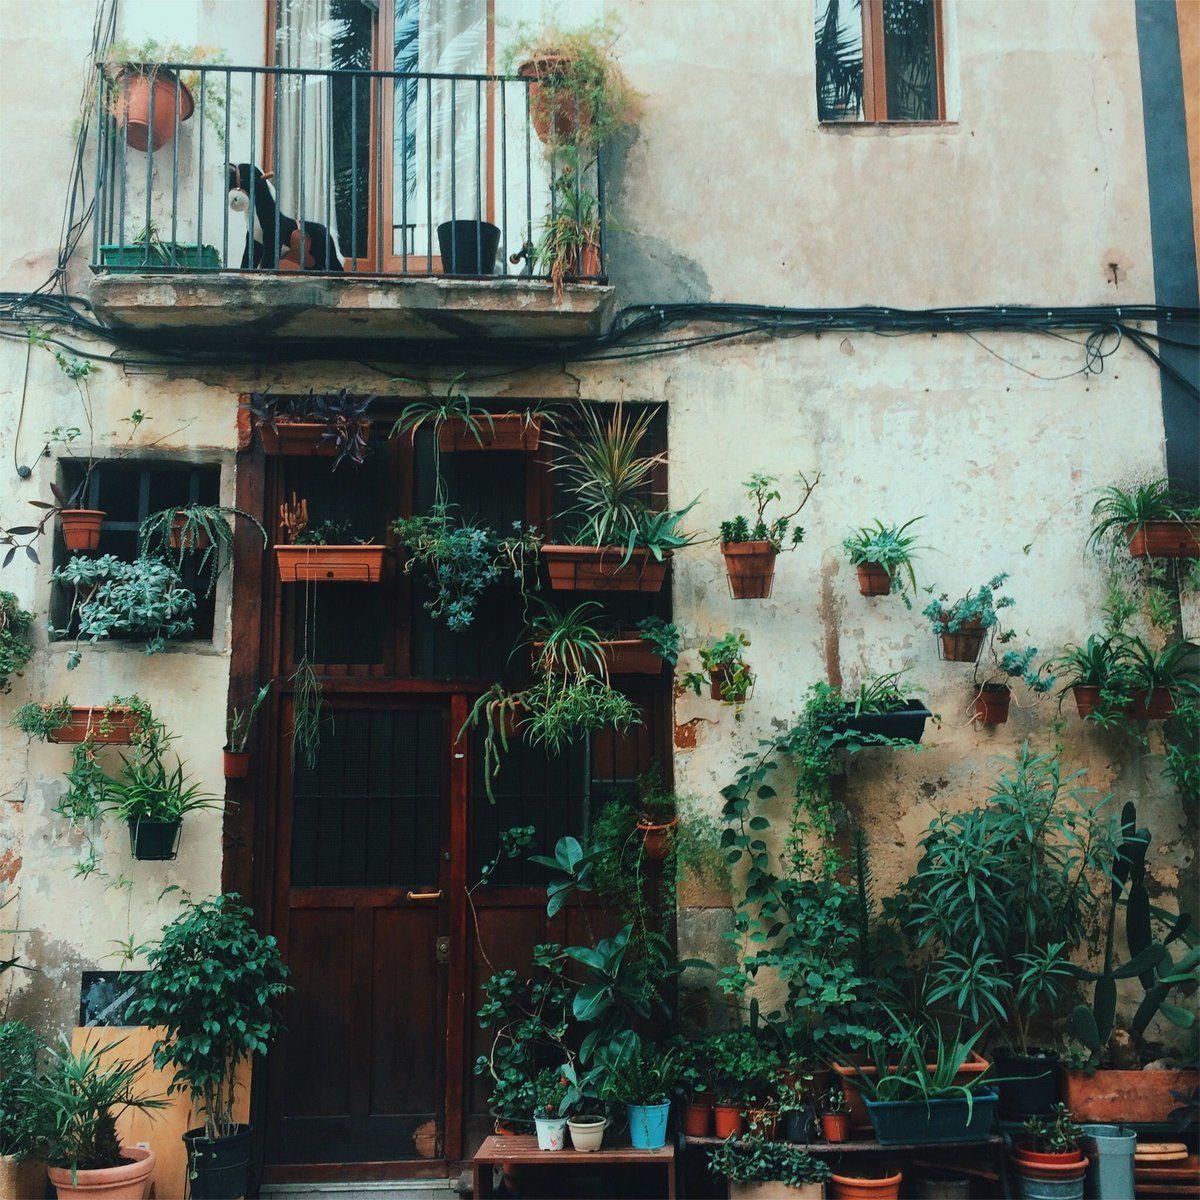 431 Twitter Dubrovnik Old Town Urban Village Building Facade